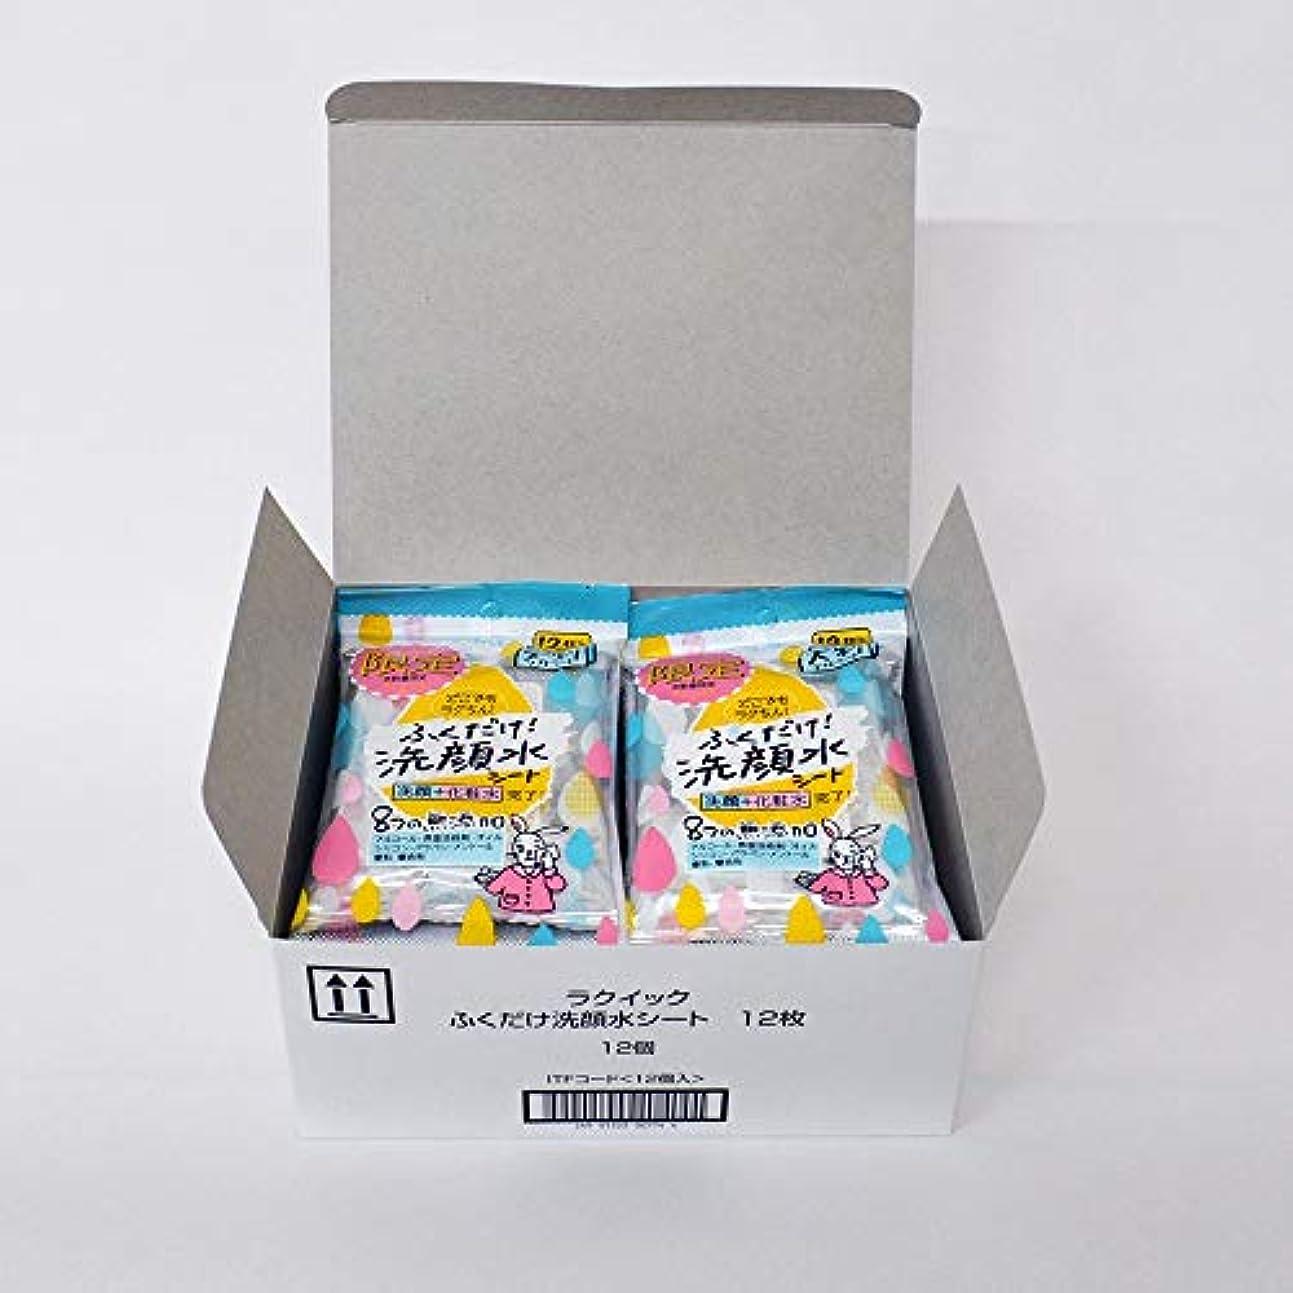 【Amazon.co.jp 限定】 ラクイック 大判シート12枚入り 12個セット